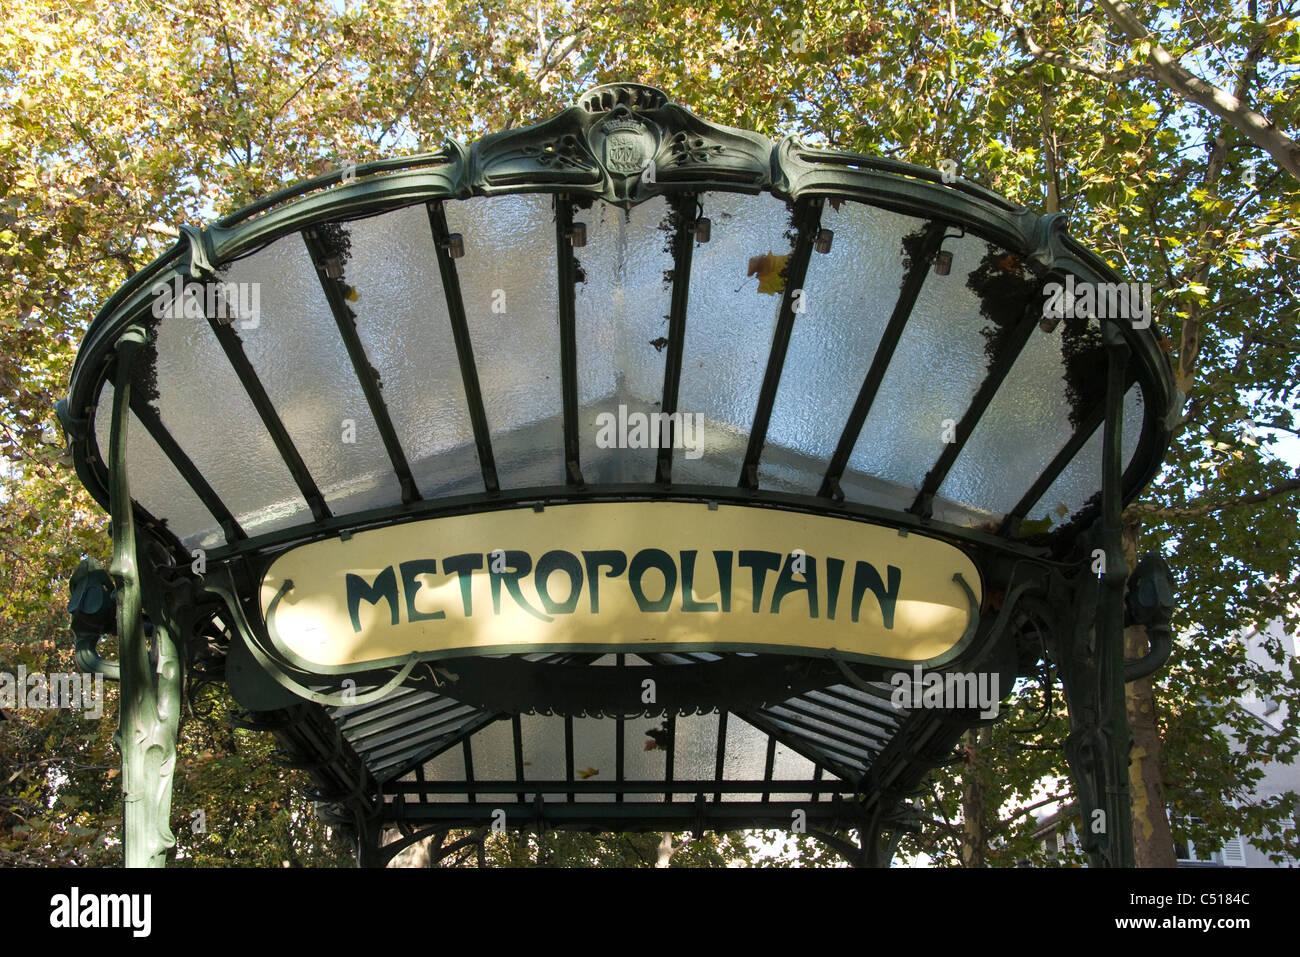 Paris metro sign - Stock Image